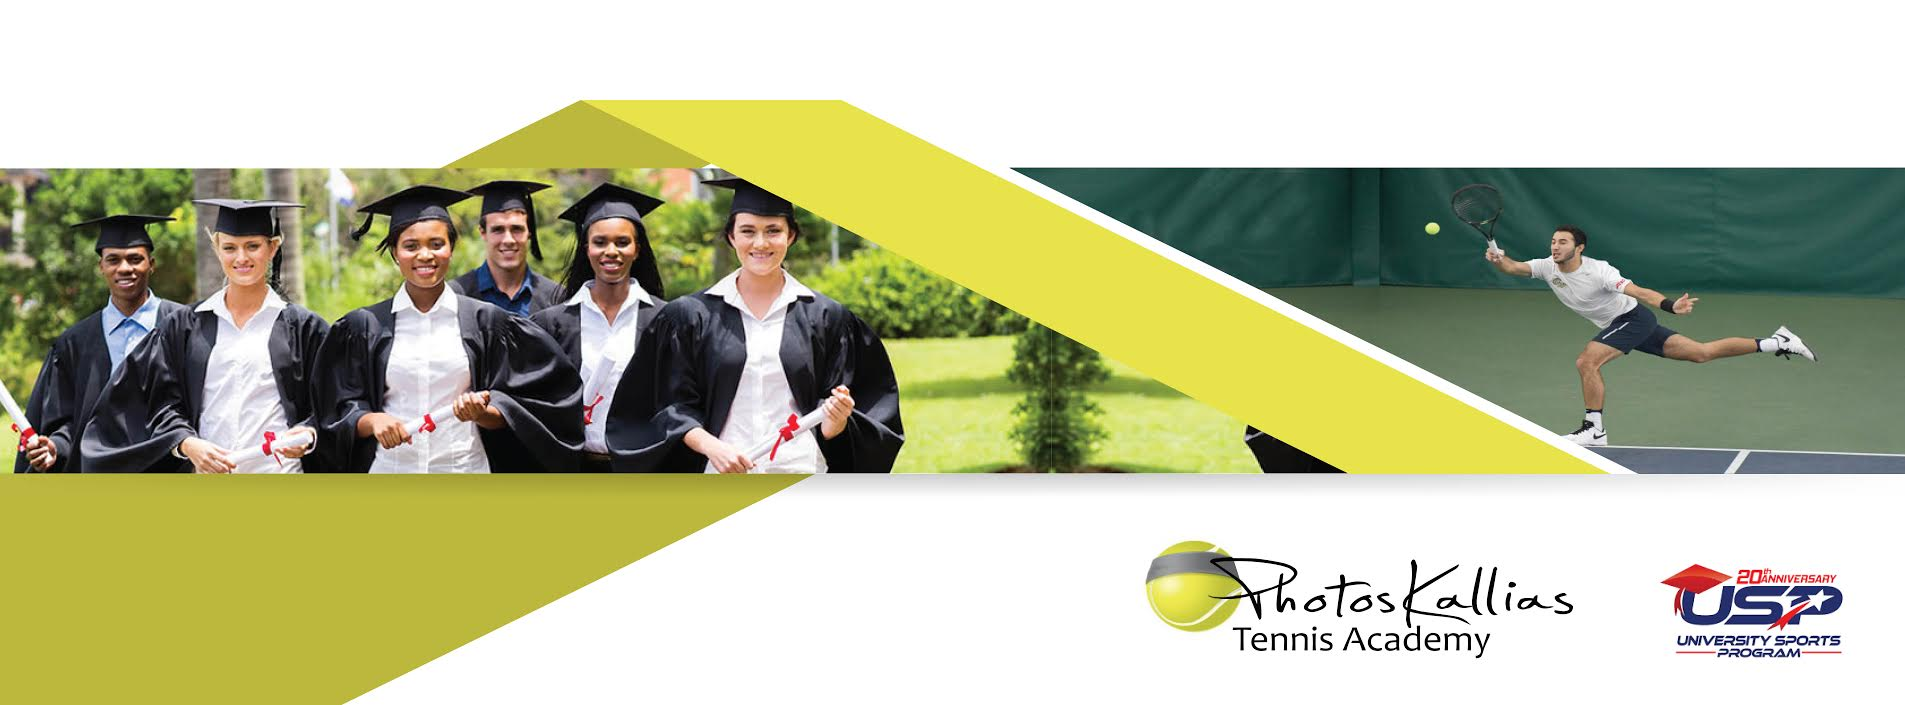 USP & Photos Kallias Tennis Academy  LimitedCollegePlacementProgram